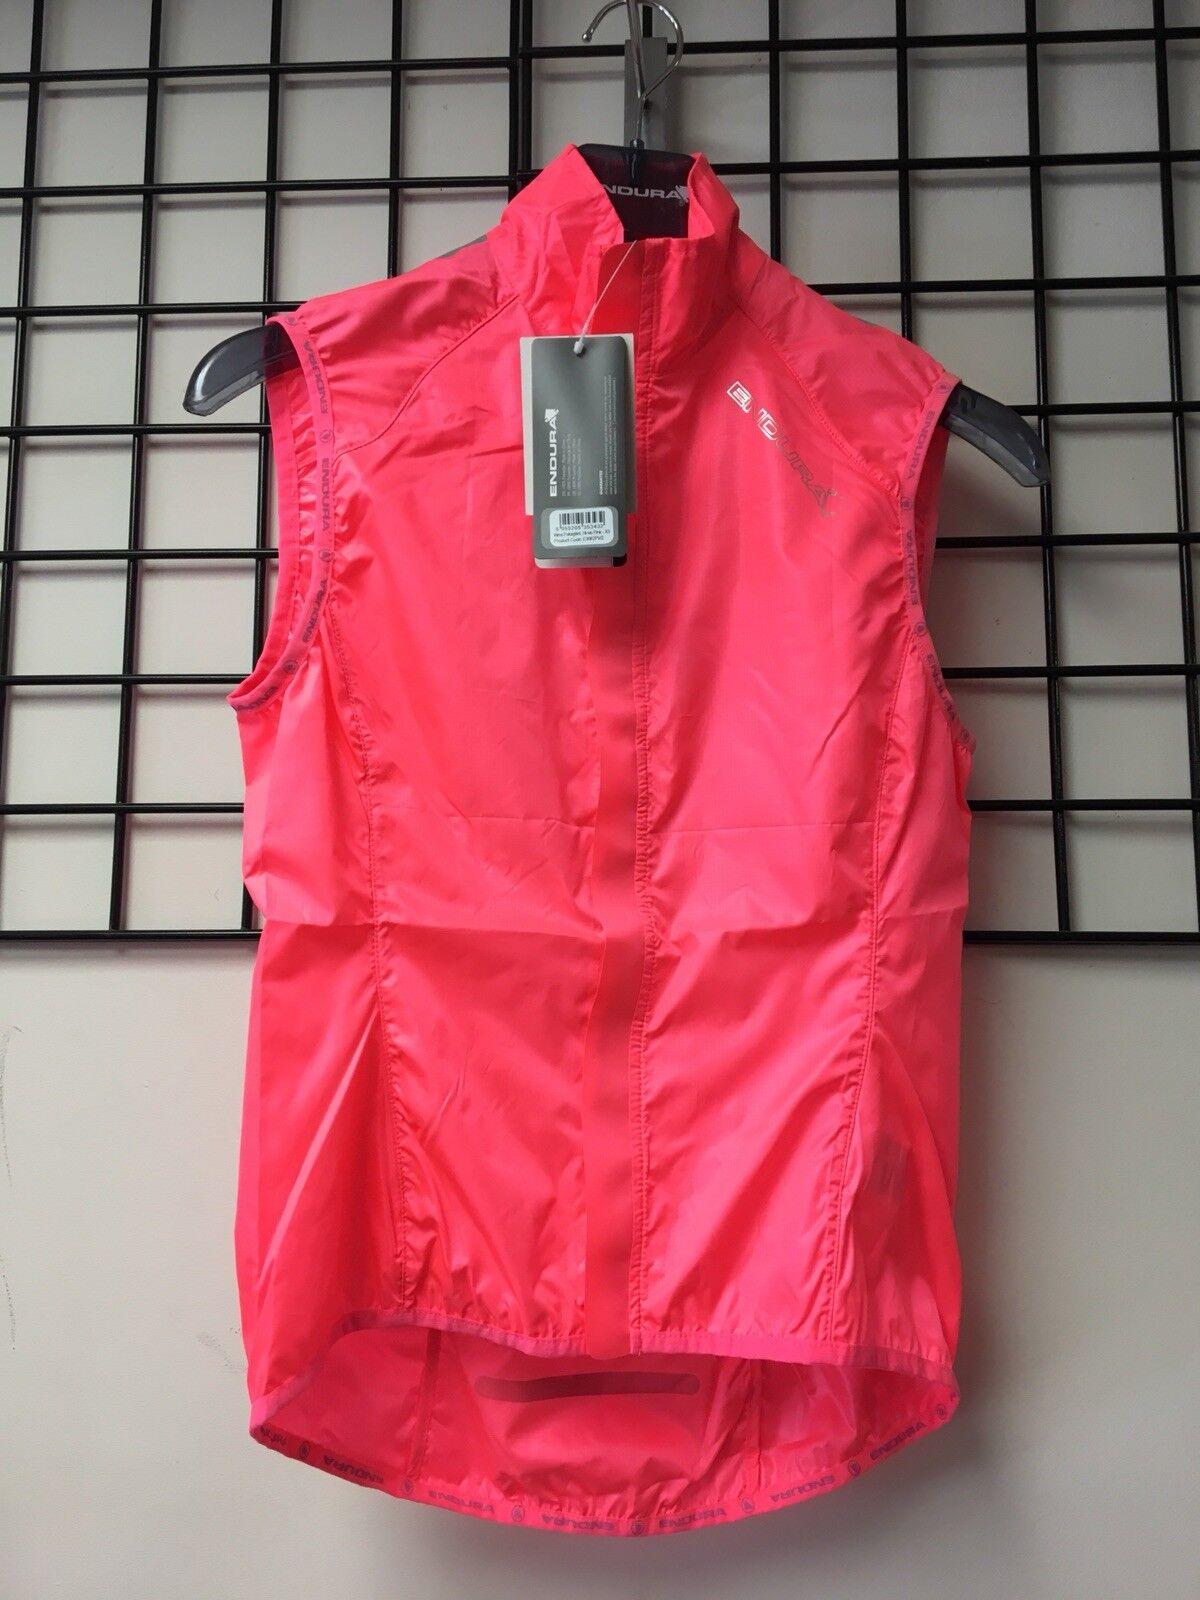 Endura Womans Cycling Vest Pink